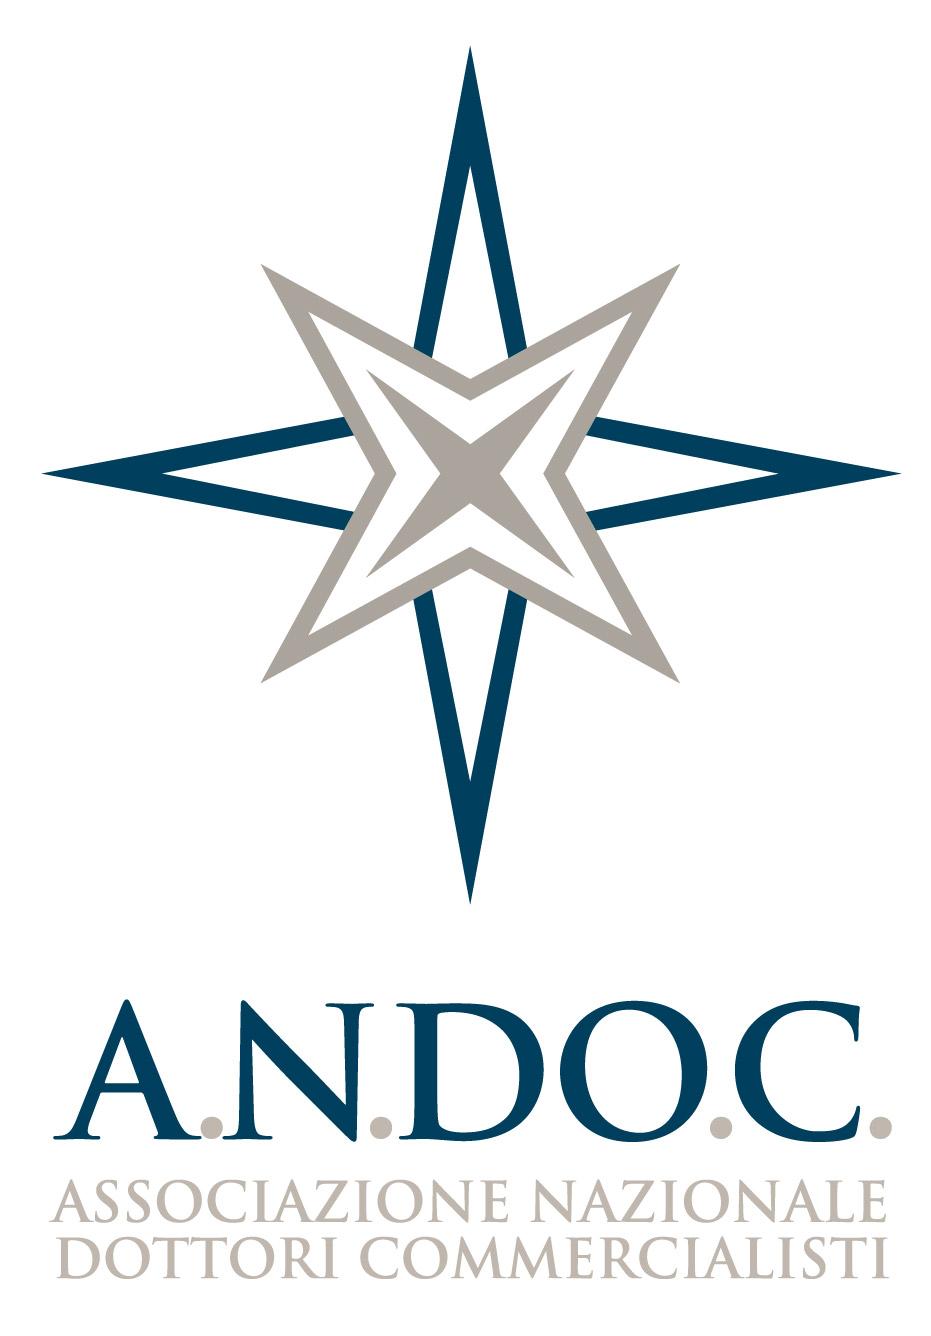 Consiglio Direttivo A.N.Do.C